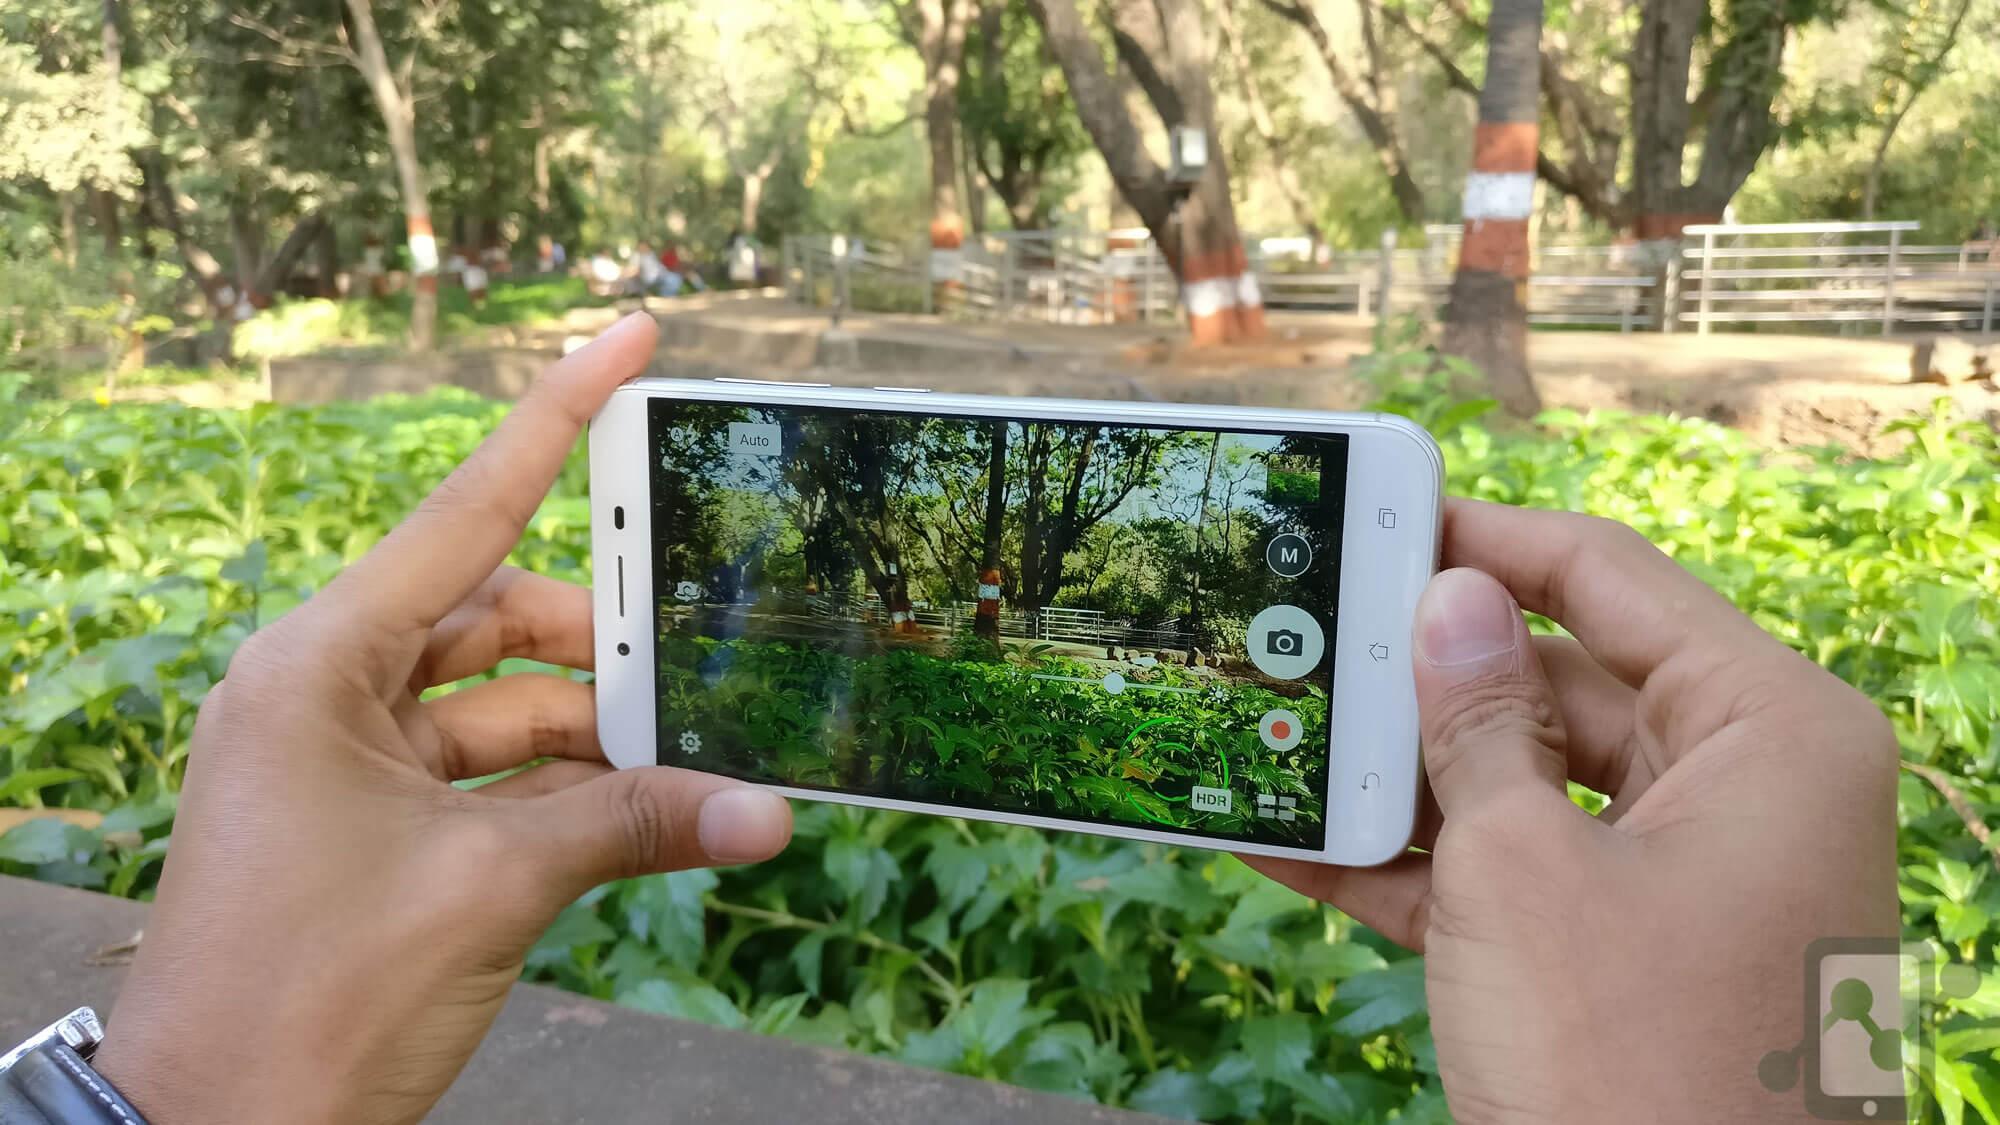 Asus Zenfone 3 Max Camera Review